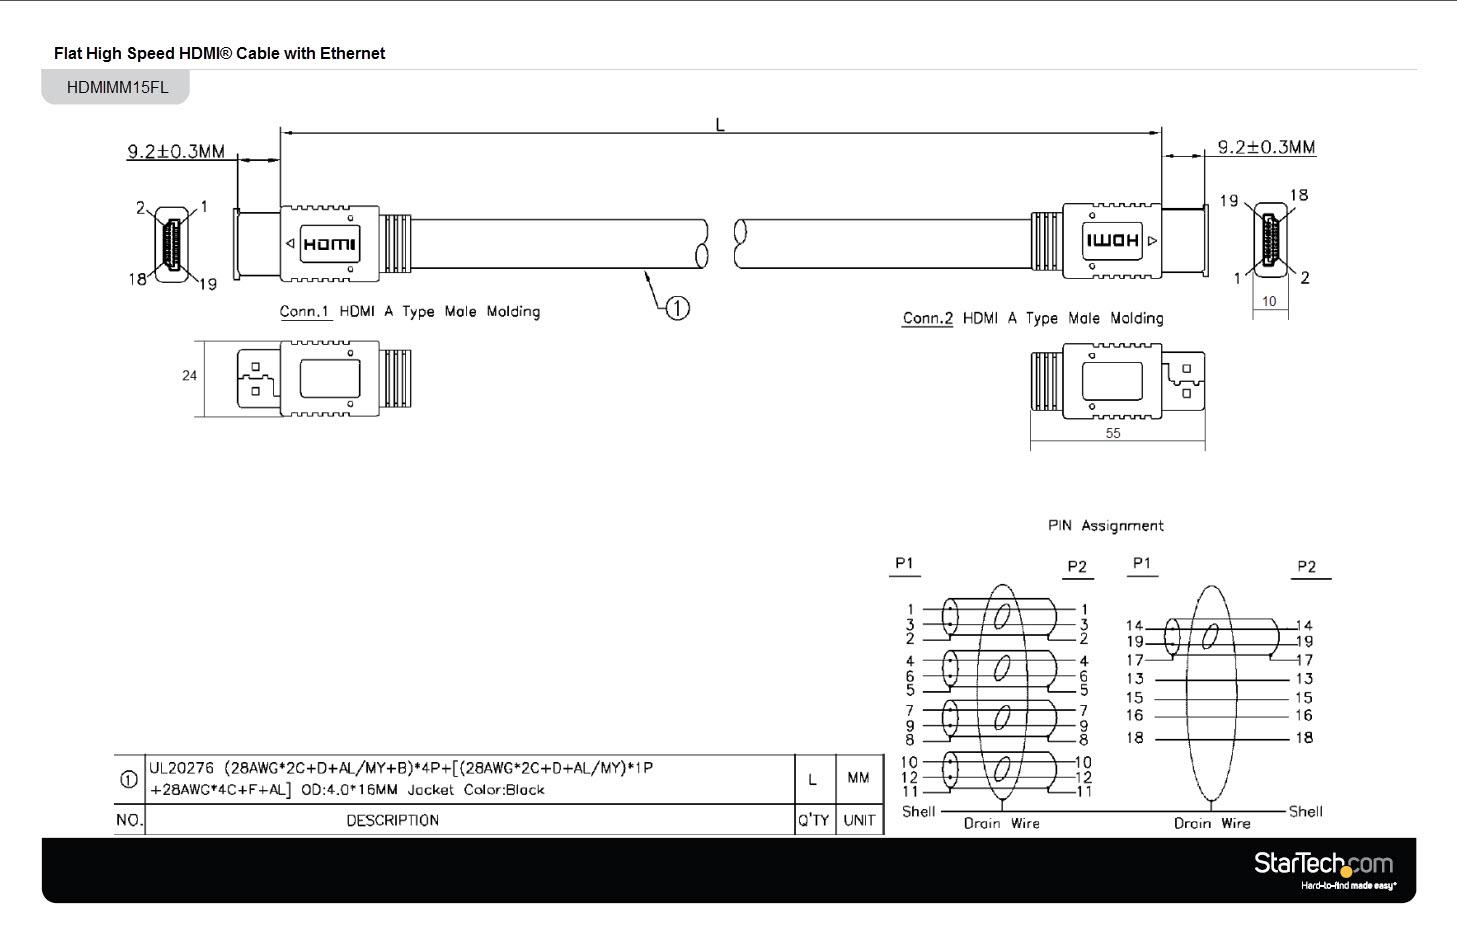 hdmi over cat5 wiring diagram Download-Diagram s 12-s